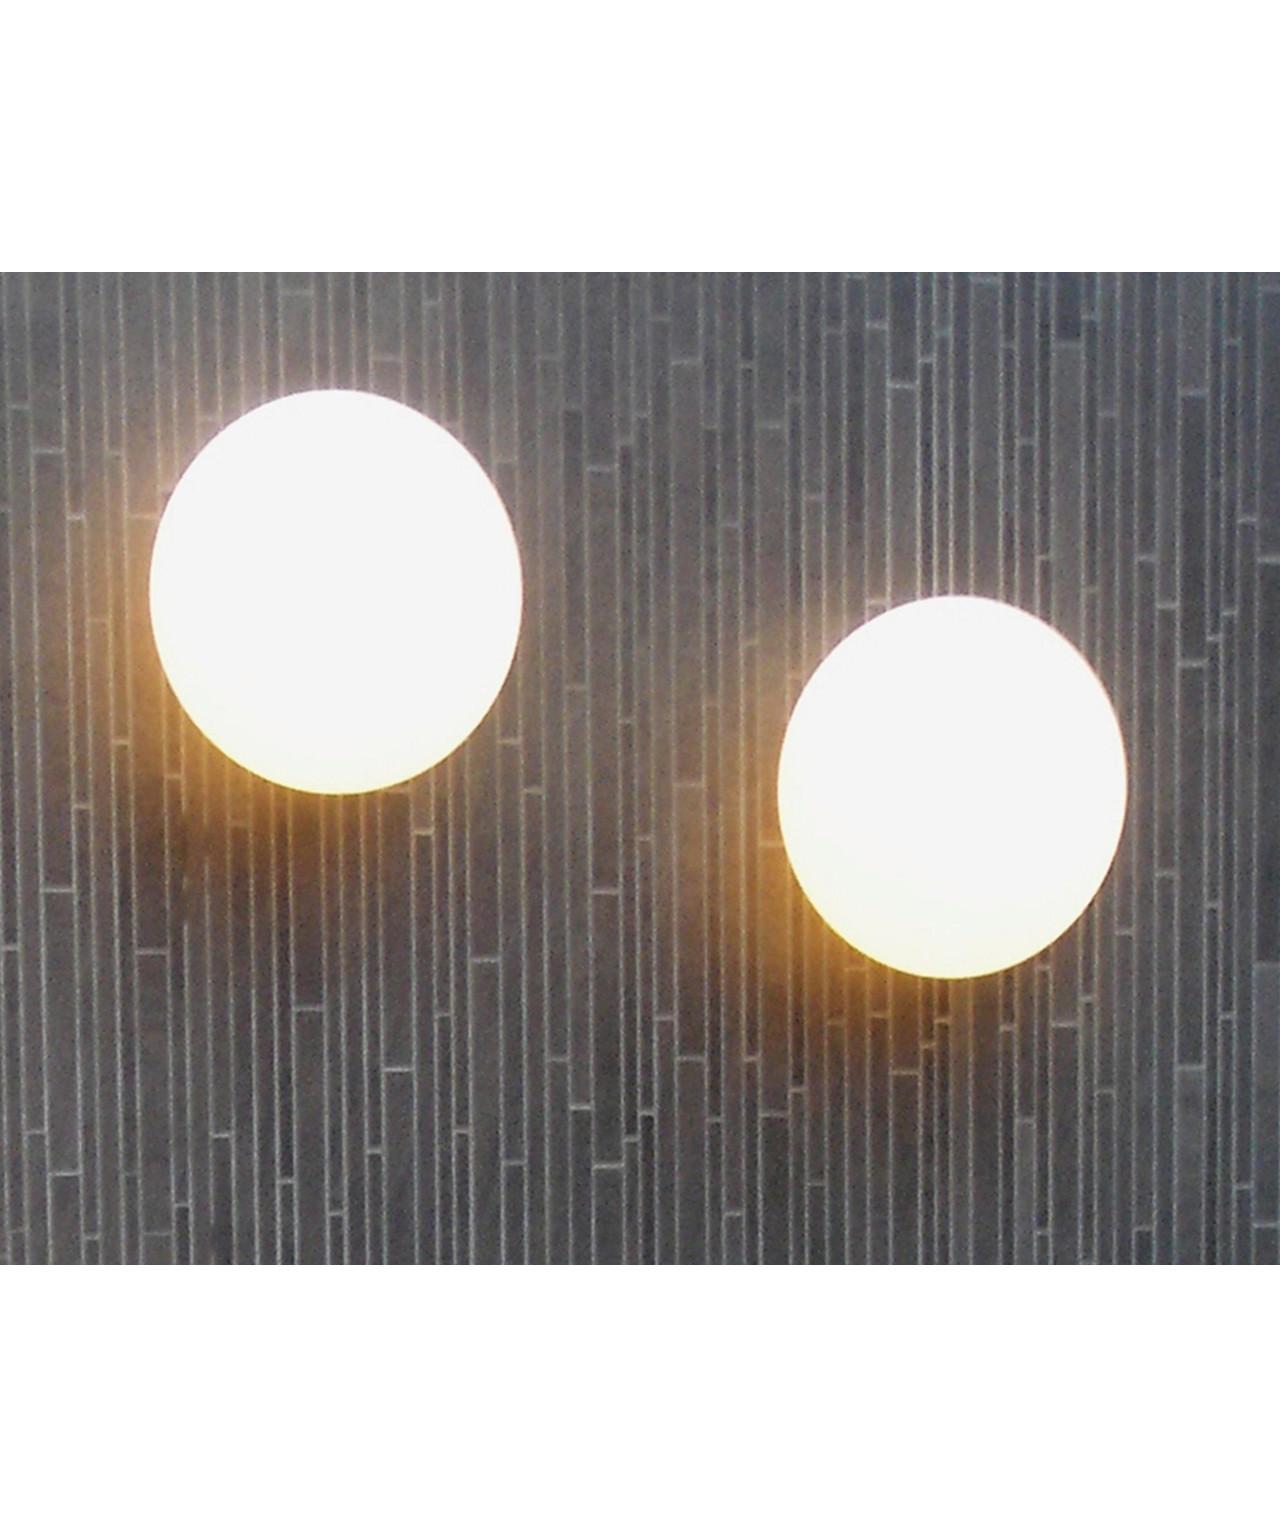 Image of   Eggy Pop Up Loftlampe/Væglampe Medium Ø55 - CPH Lighting